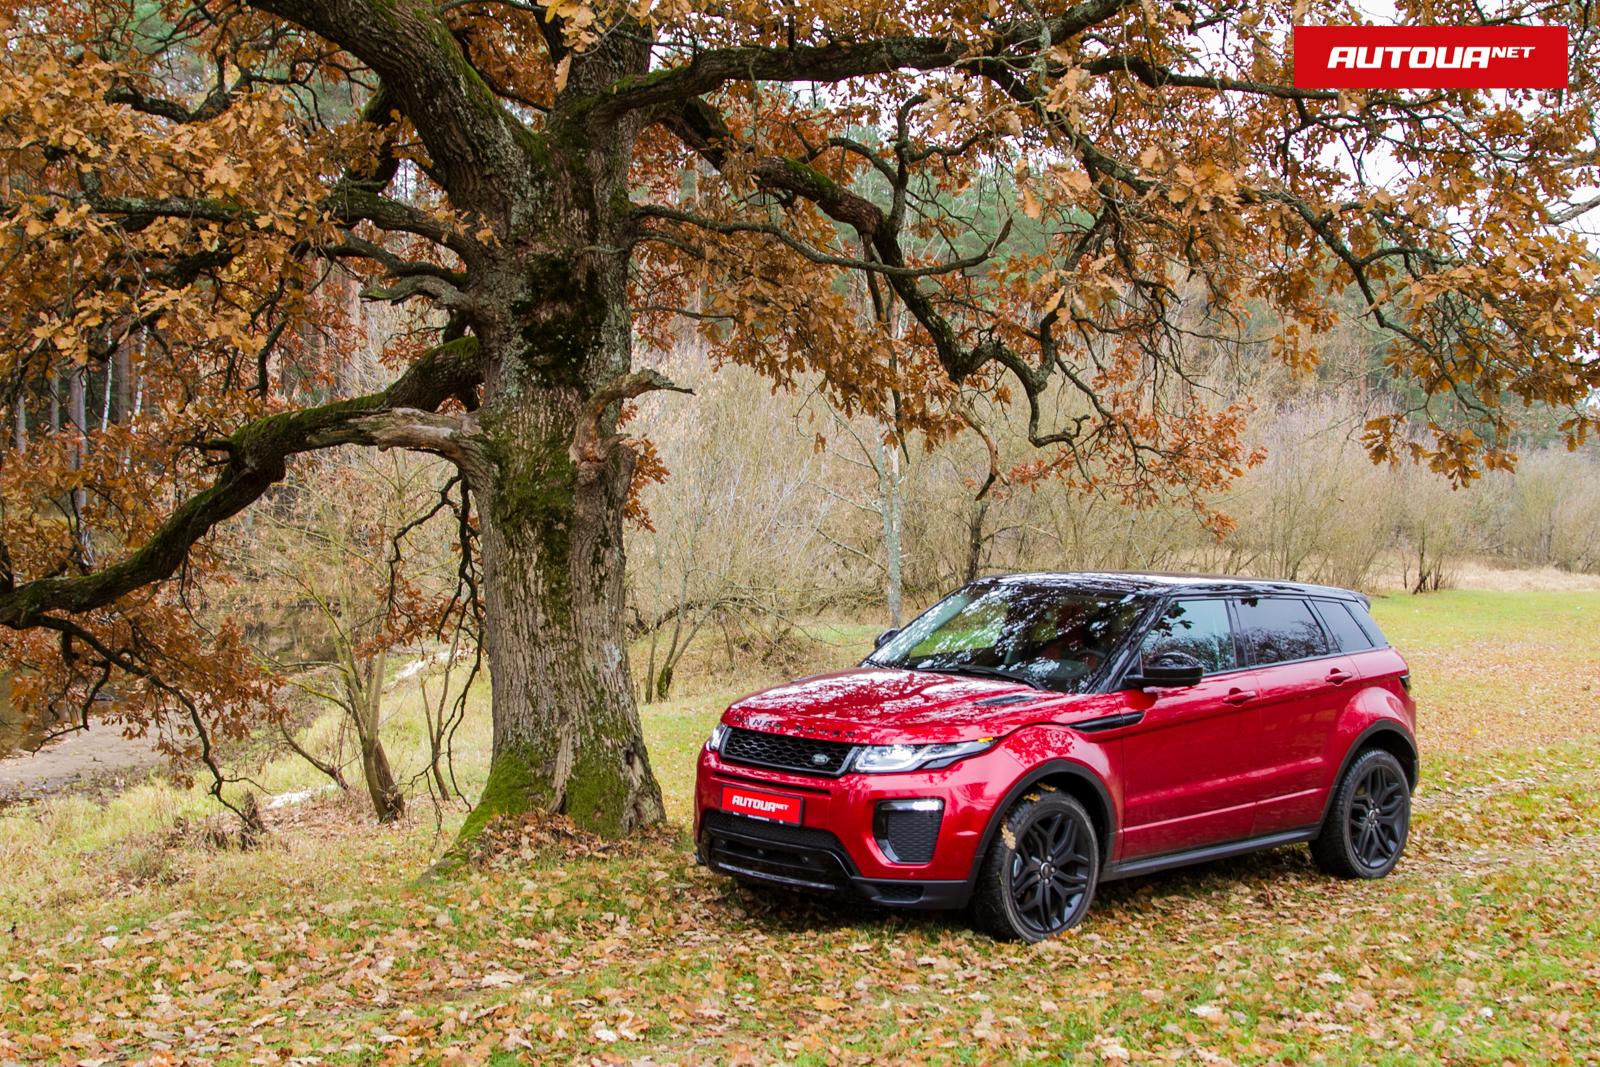 Тест-драйв Land Rover Range Rover Evoque: Открываем Полесье вместе с новым Range Rover Evoque.